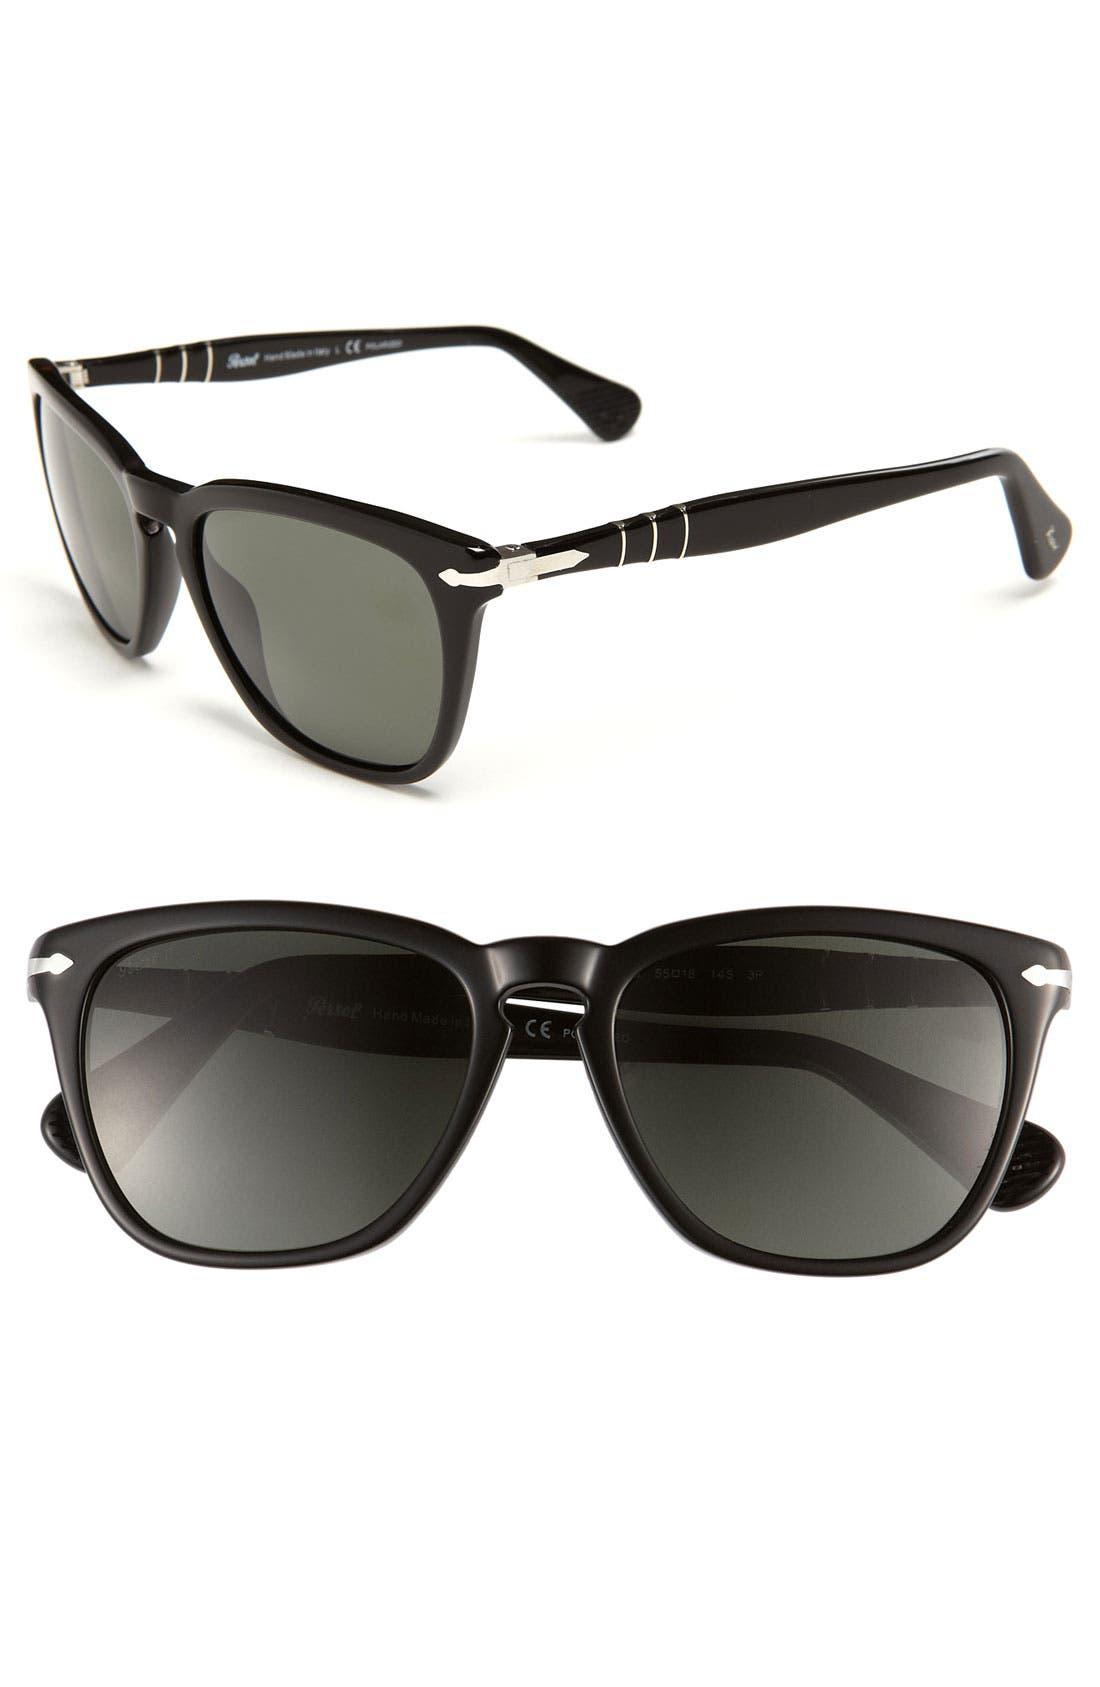 Main Image - Persol Capri Sunglasses